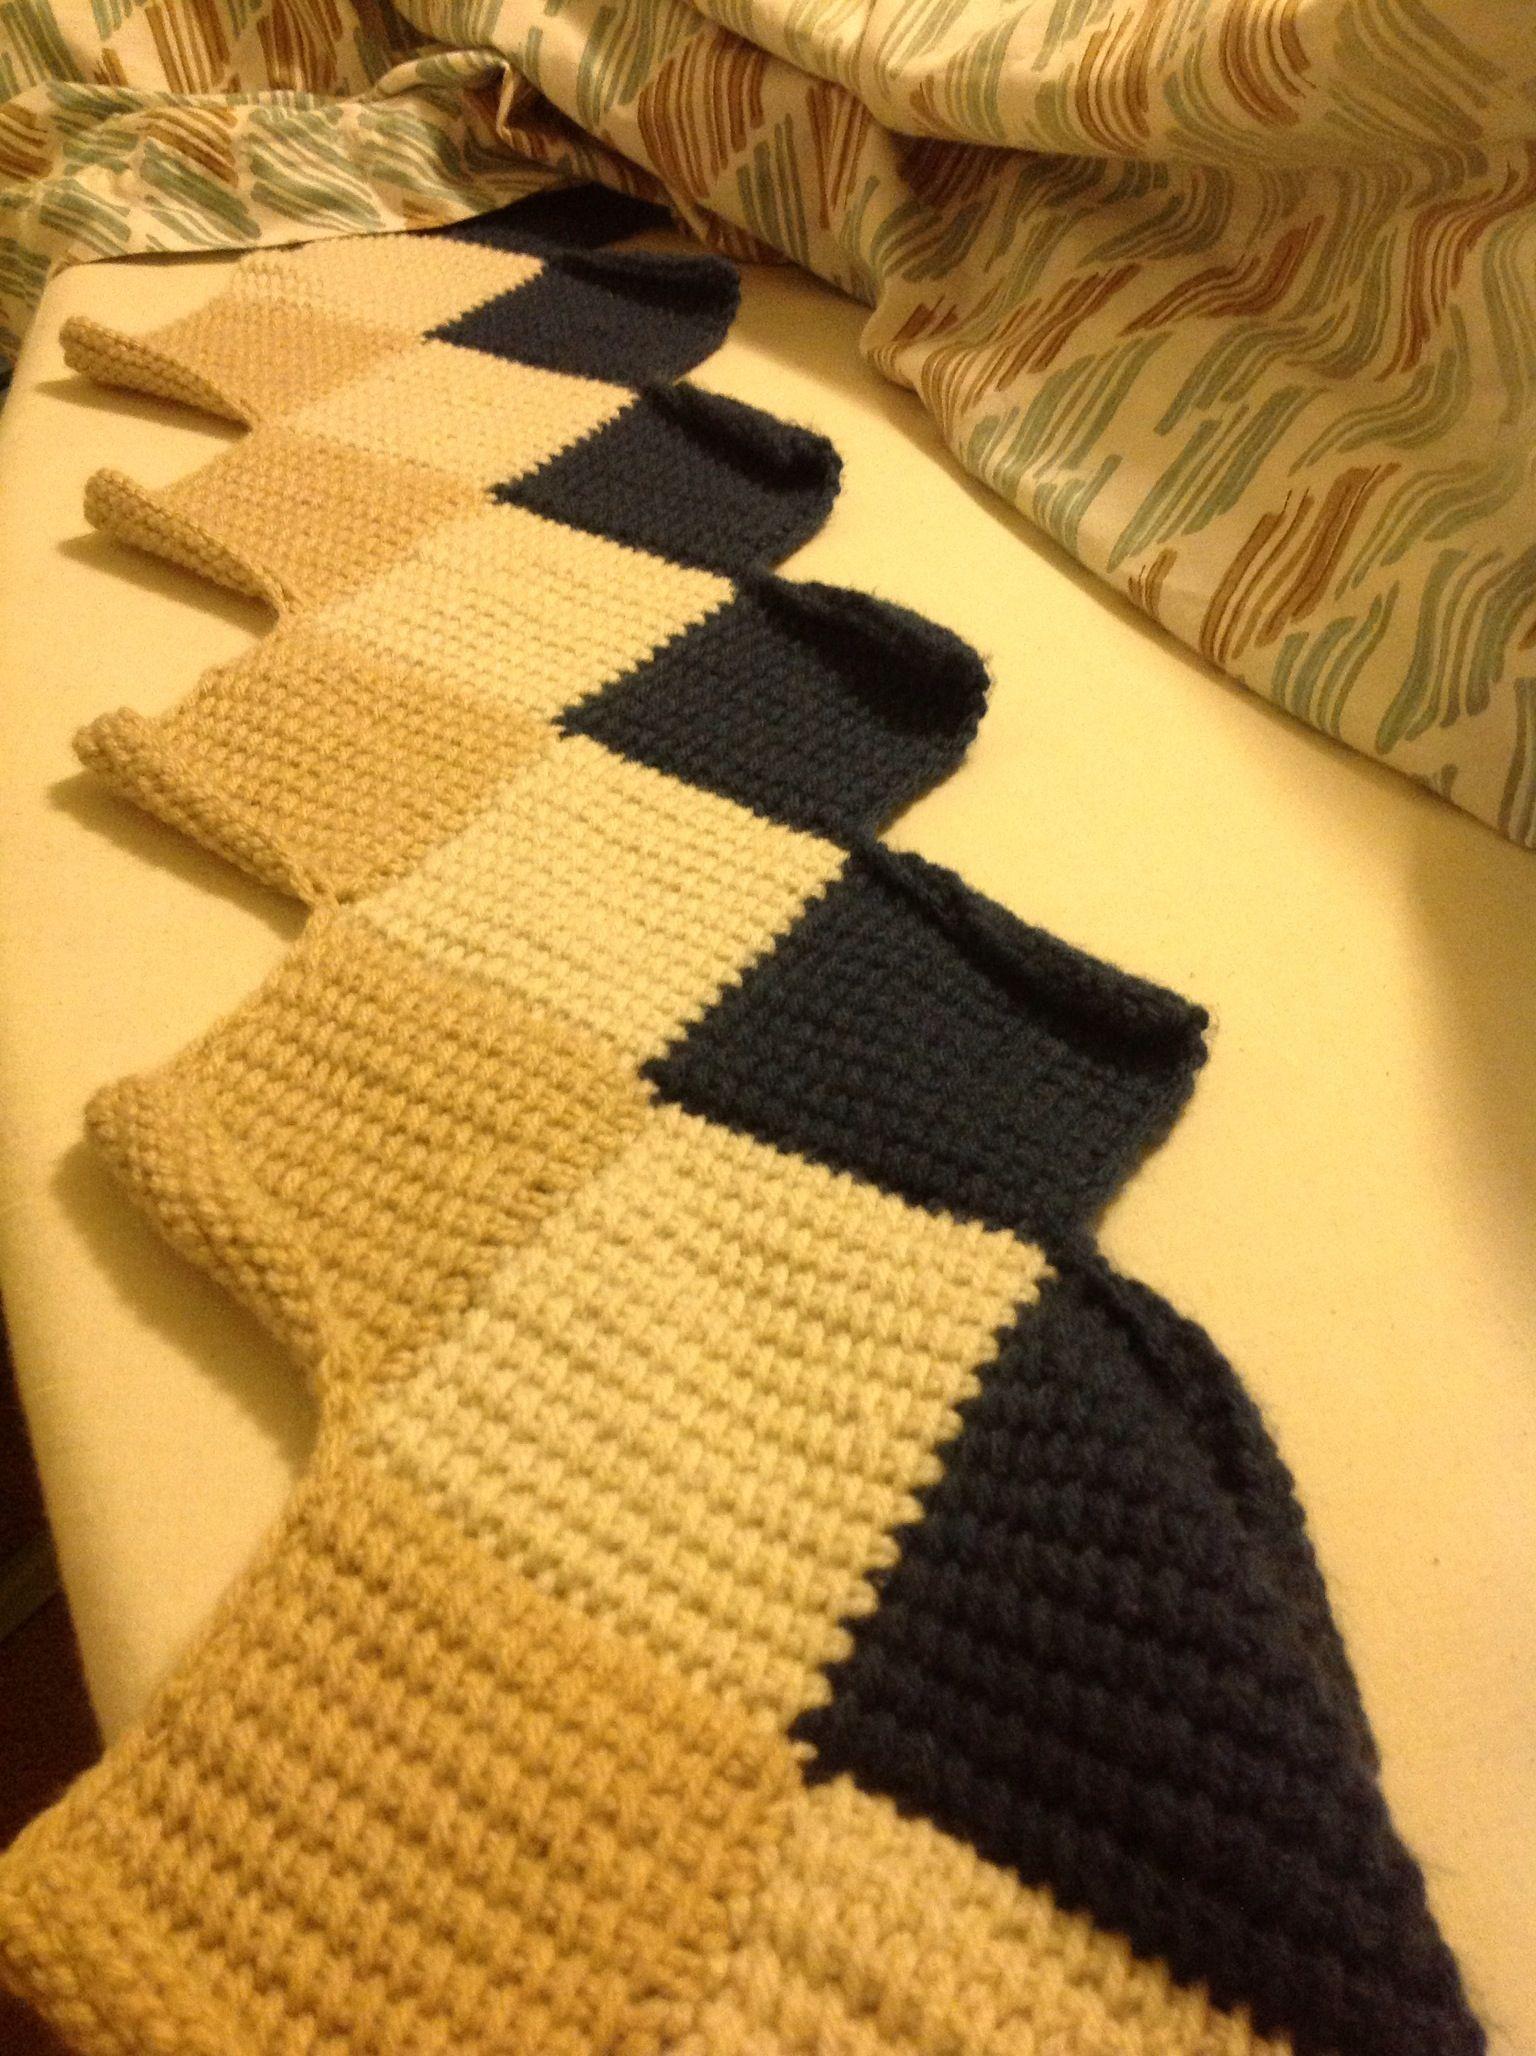 Tunisian crochet entrelac scarf tunisian crochet pinterest tunisian crochet entrelac scarf bankloansurffo Gallery